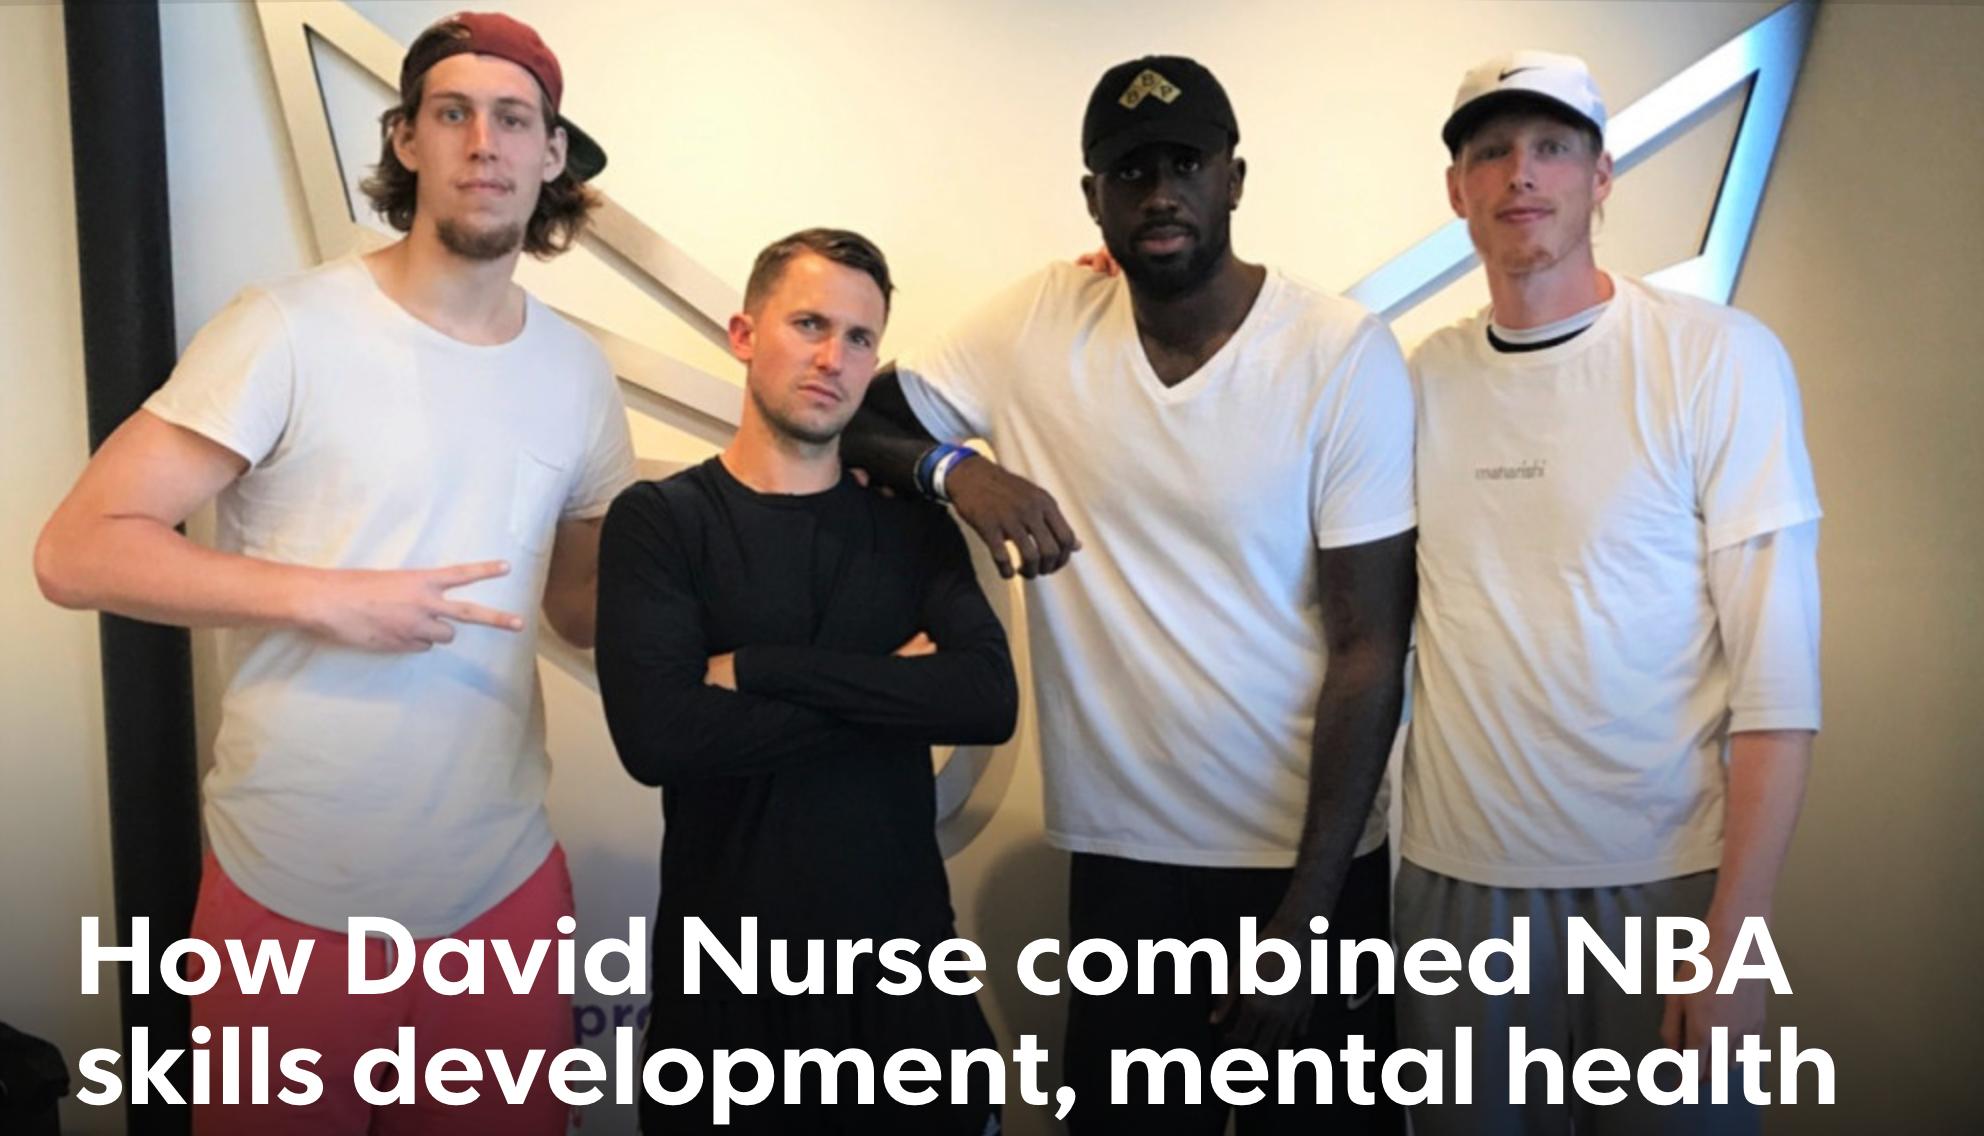 David Nurse with Basketball players